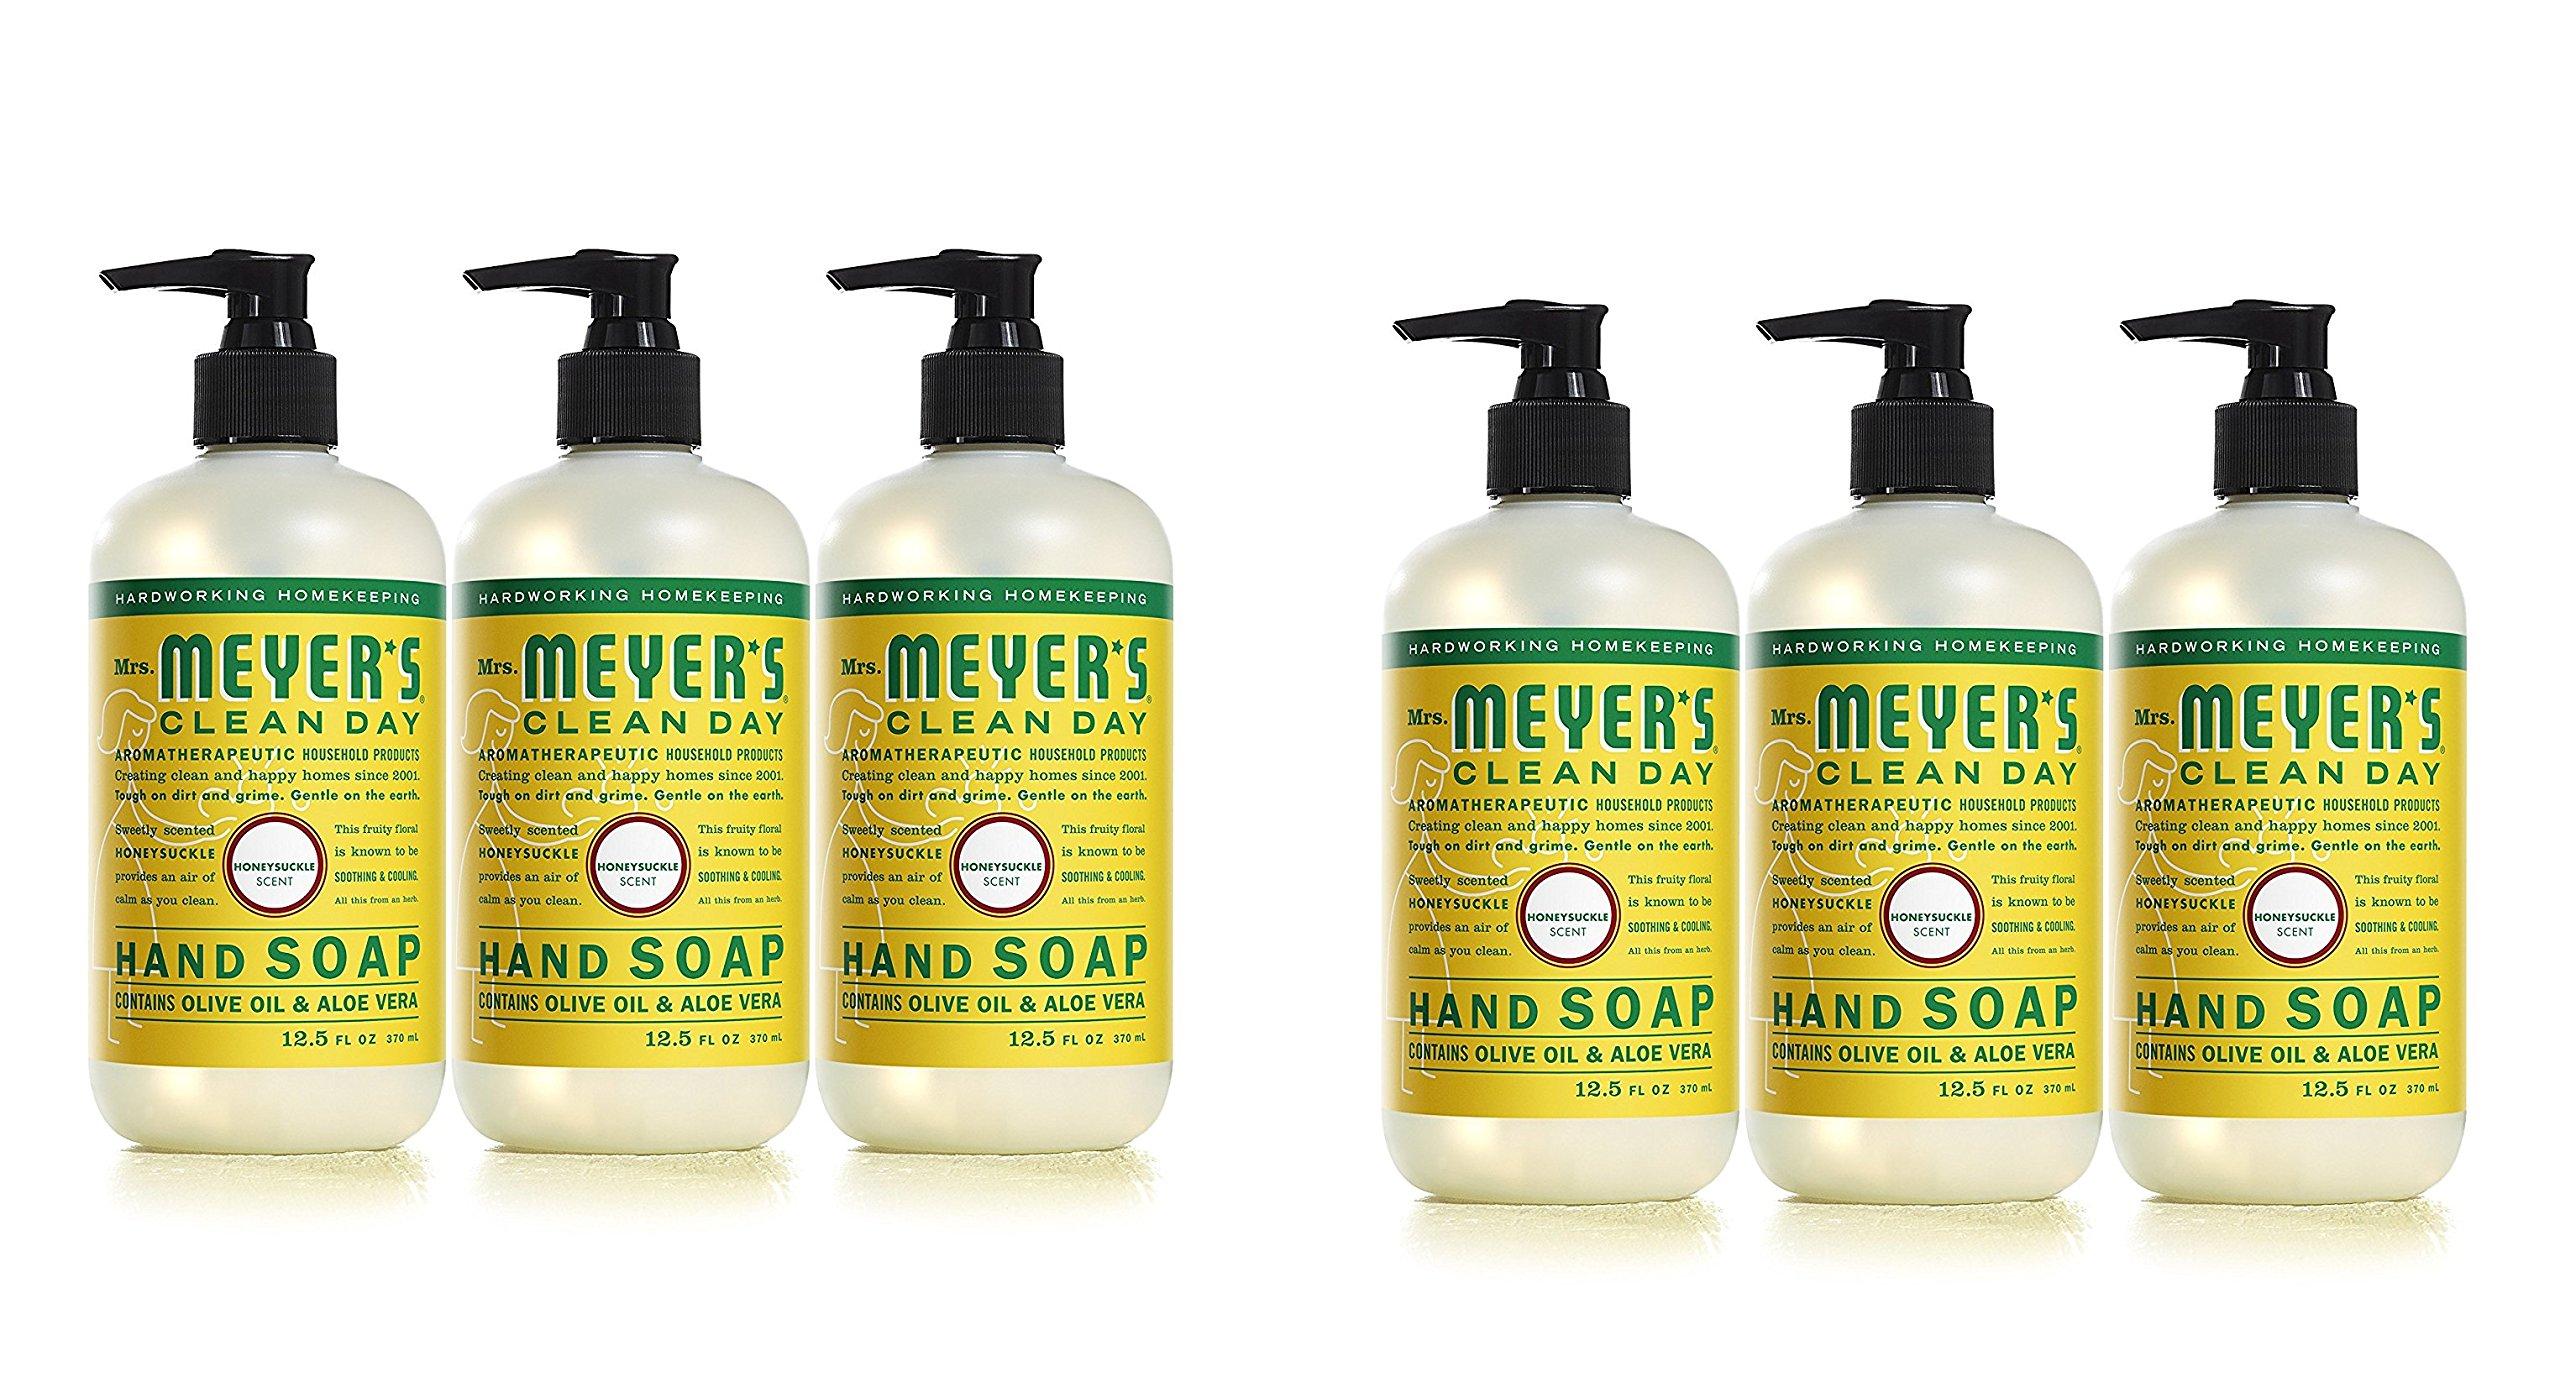 Mrs. Meyers Clean Day Hand Soap, Honeysuckle, 12.5 fl oz each, 6 Pack